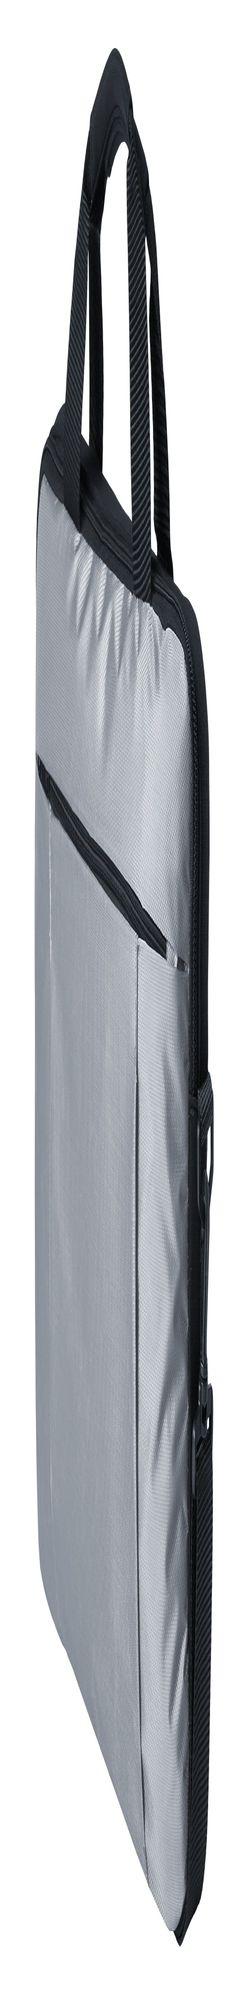 Сумка для ноутбука Modern, темно-серая фото